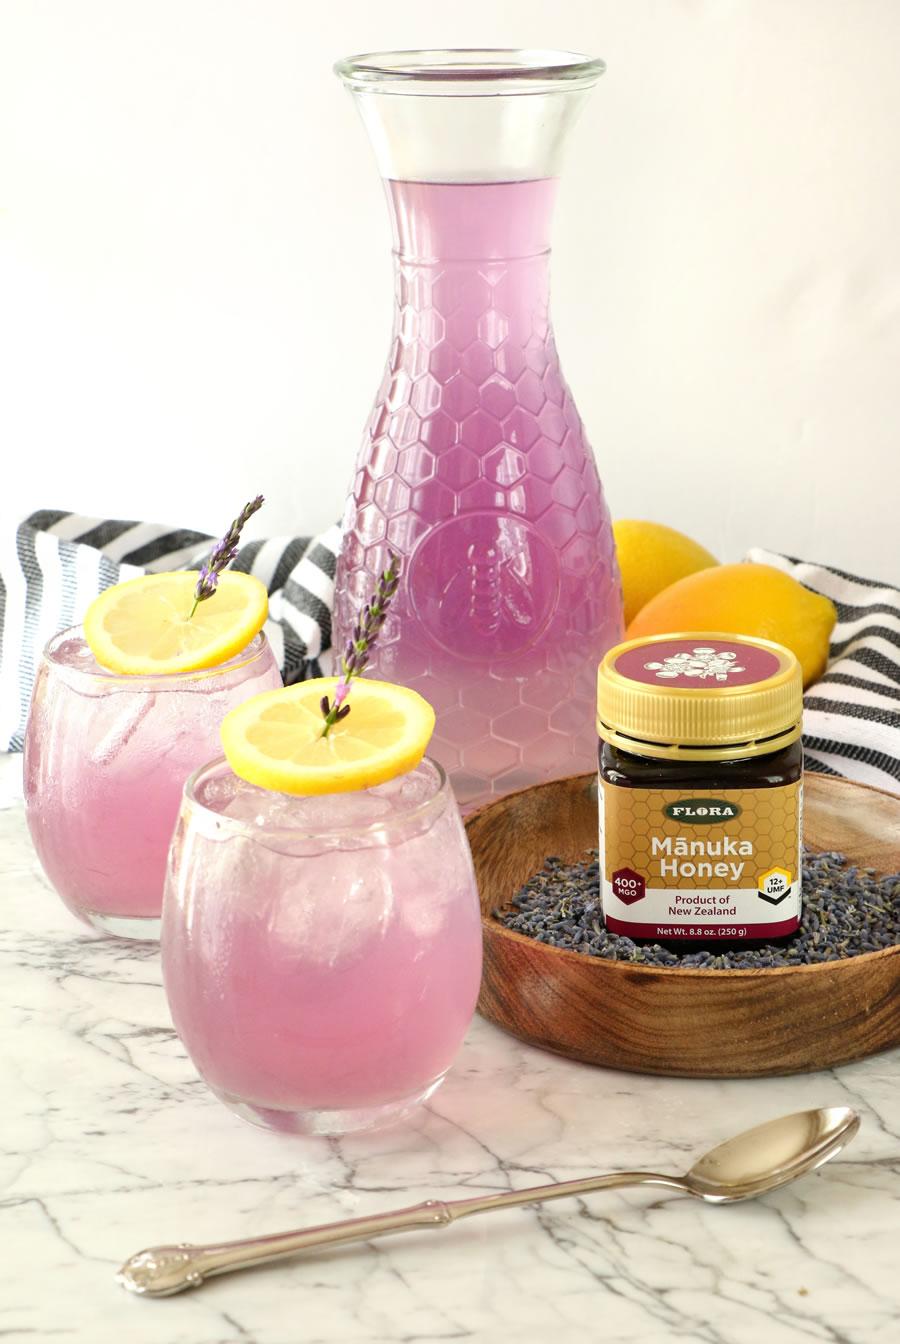 MĀNUKA HONEY + LAVENDER LEMONADE Recipe Made With Flora Manuka Honeyy